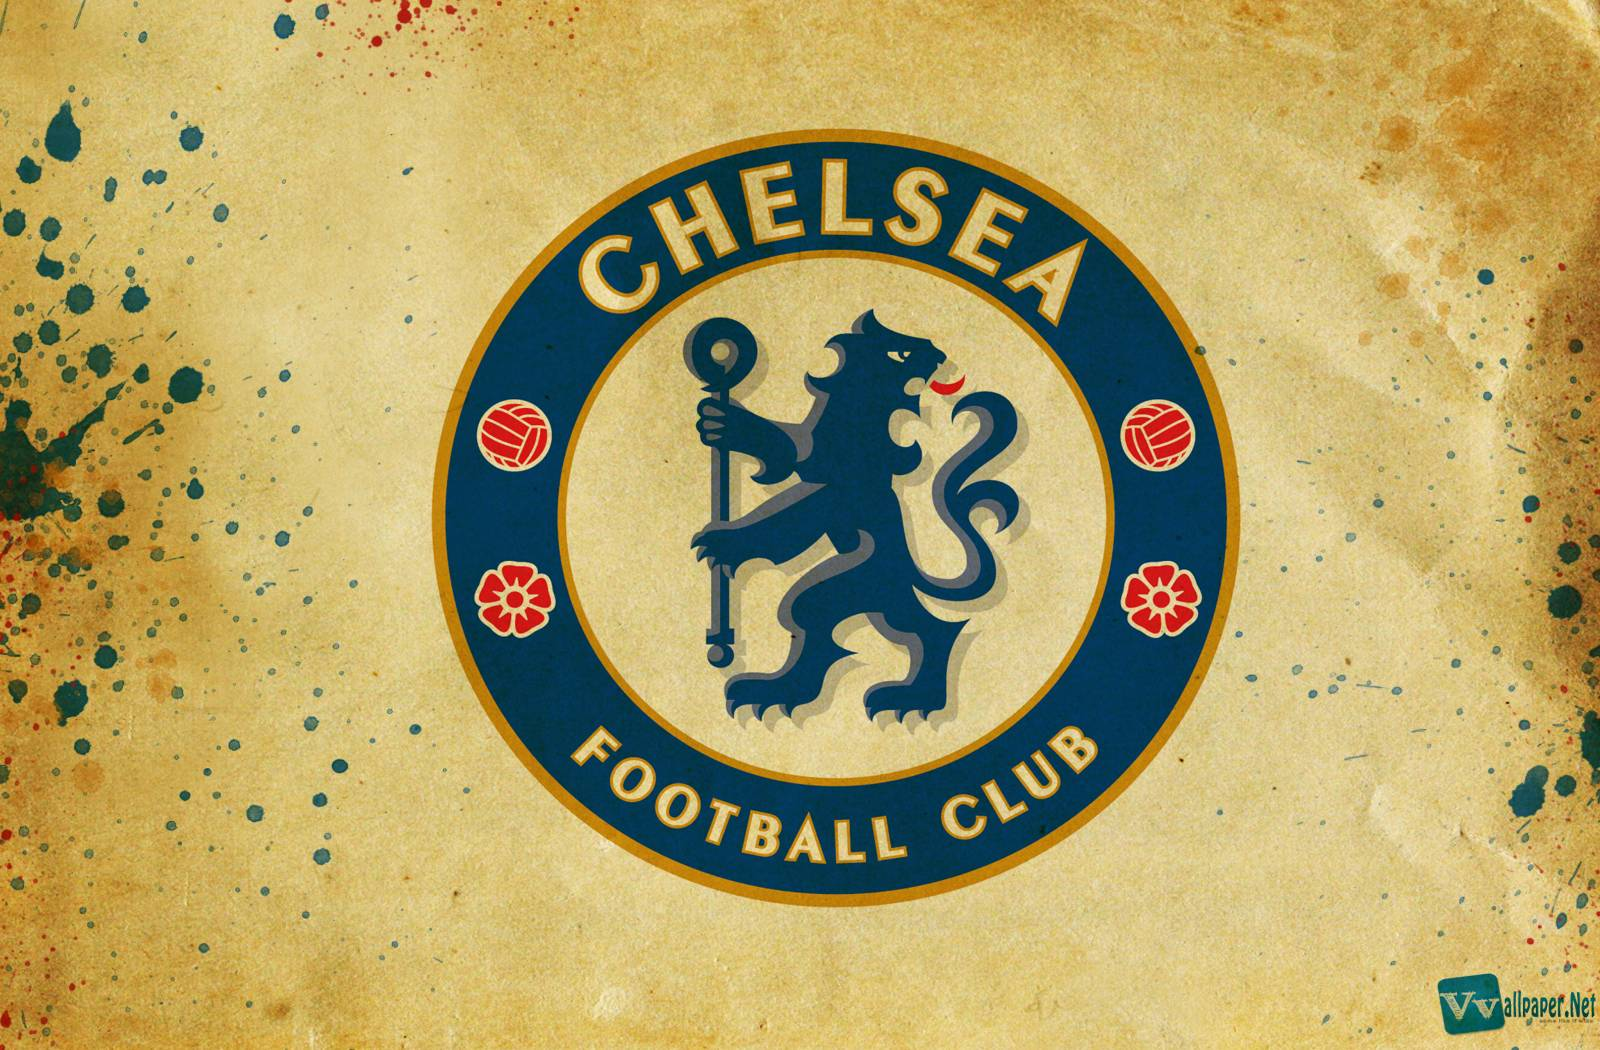 Chelsea football club wallpapers wallpaper cave hnh nn p chelsea football club wallpapers 39 voltagebd Gallery